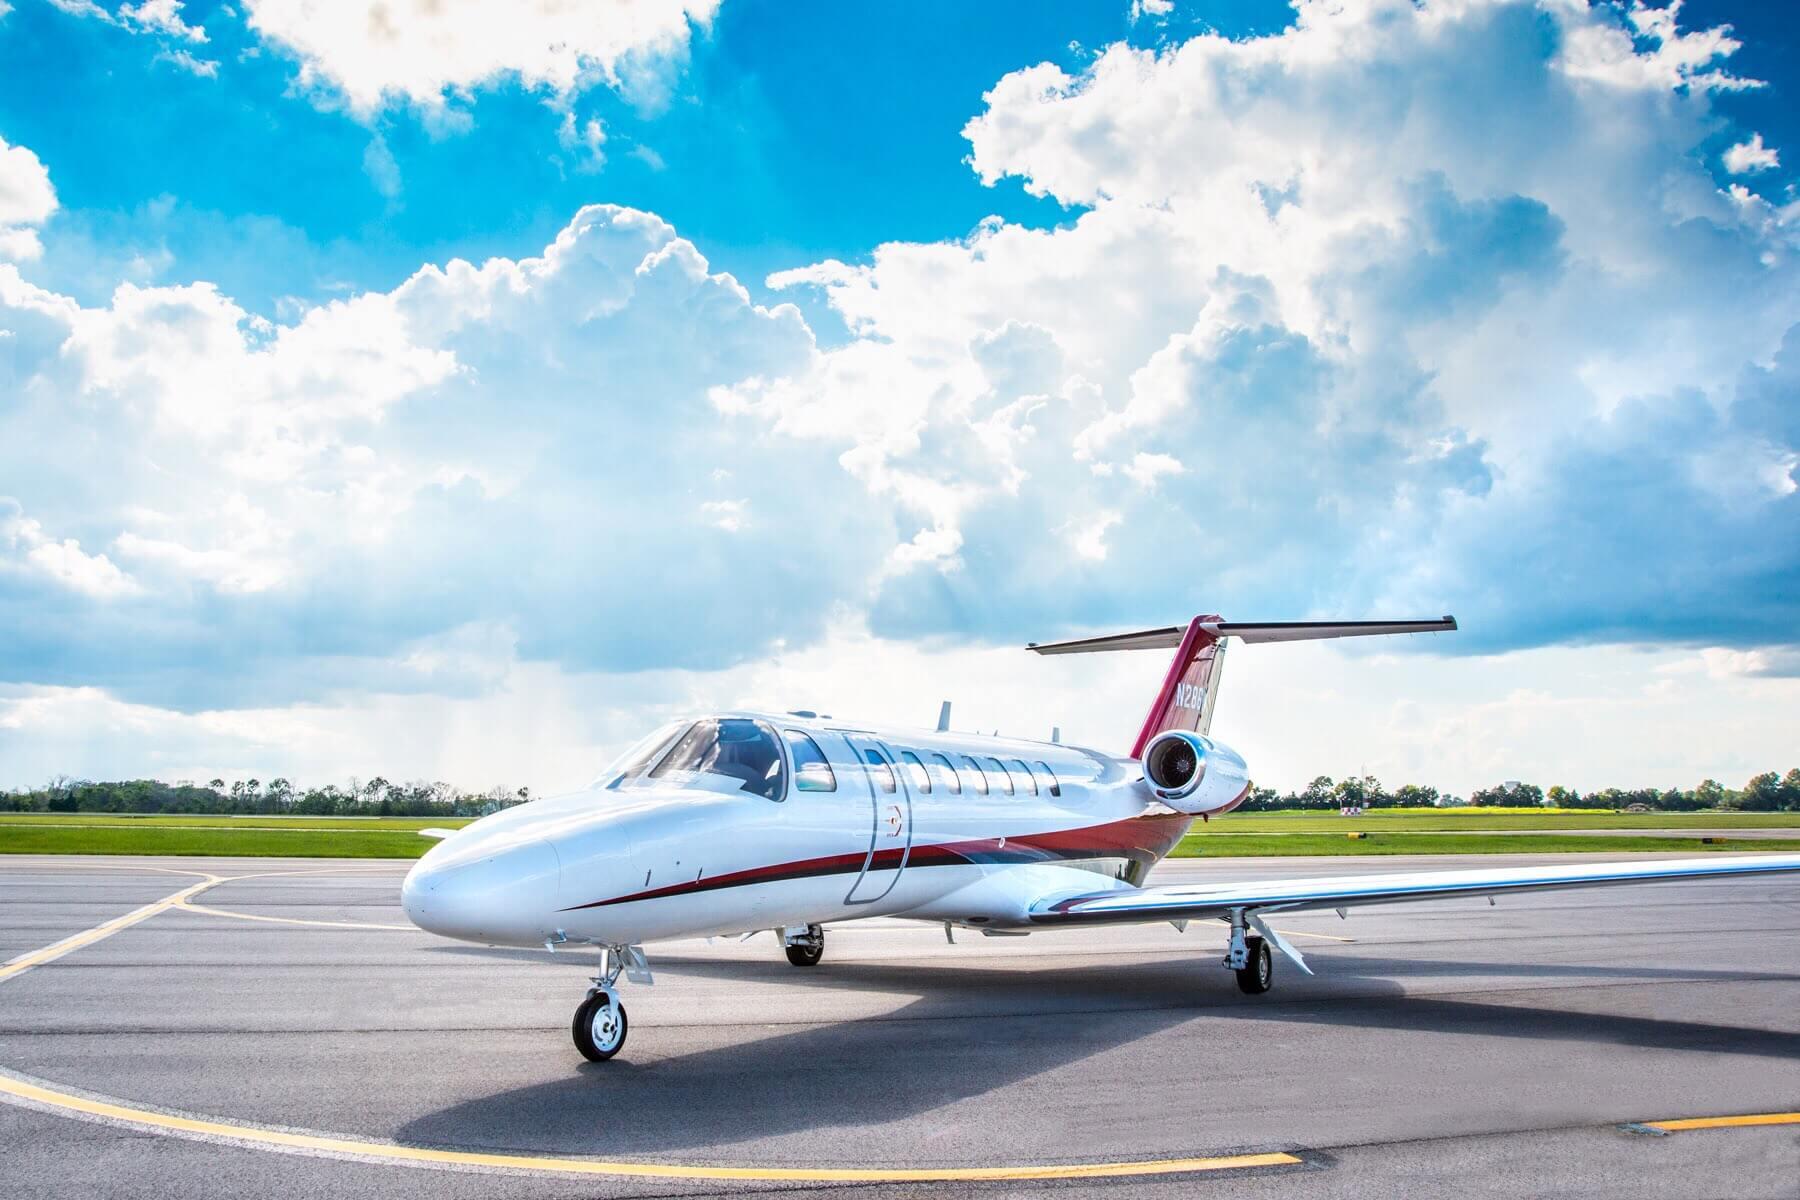 Cessna Citation CJ3 on Tarmac with Bright Blue Sky